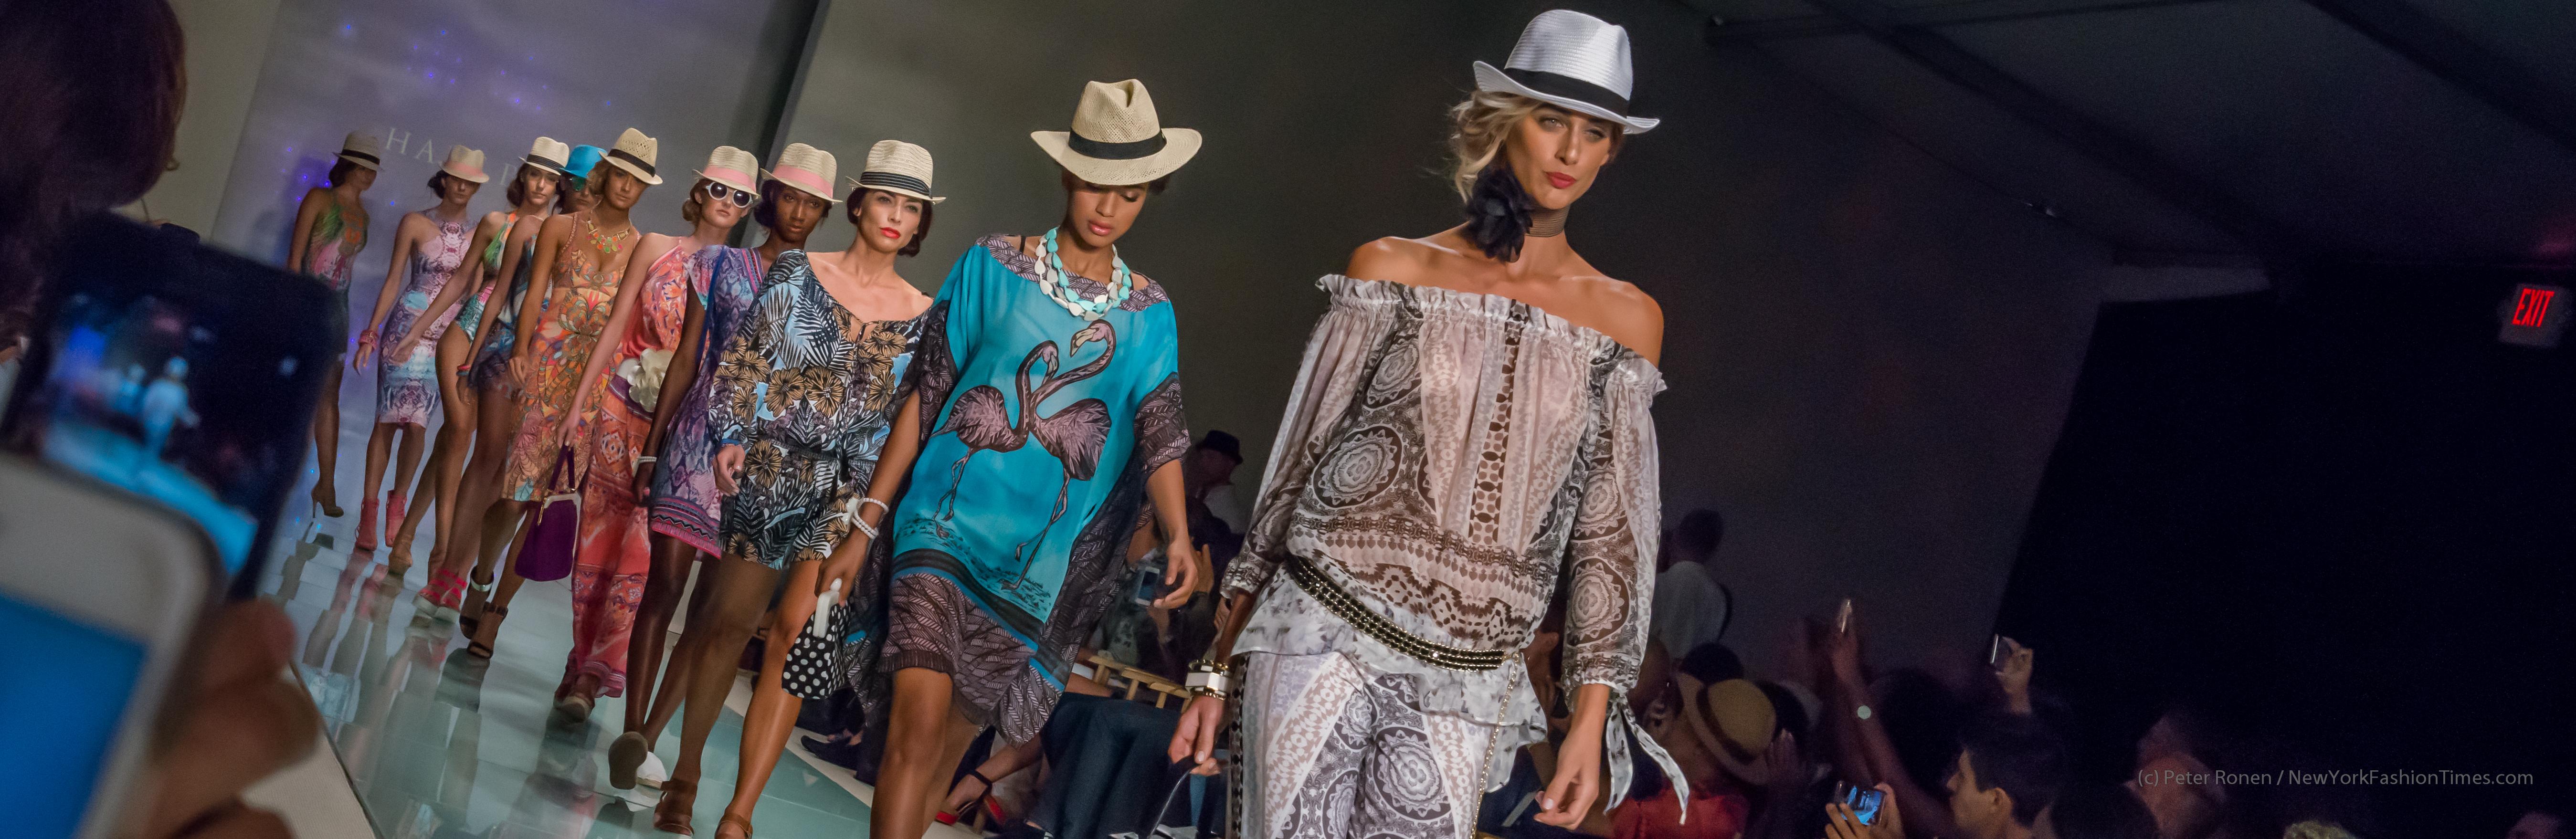 Hale Bob Resort 2017 Art Hearts Fashion Miami Funkshion New York Fashion Times